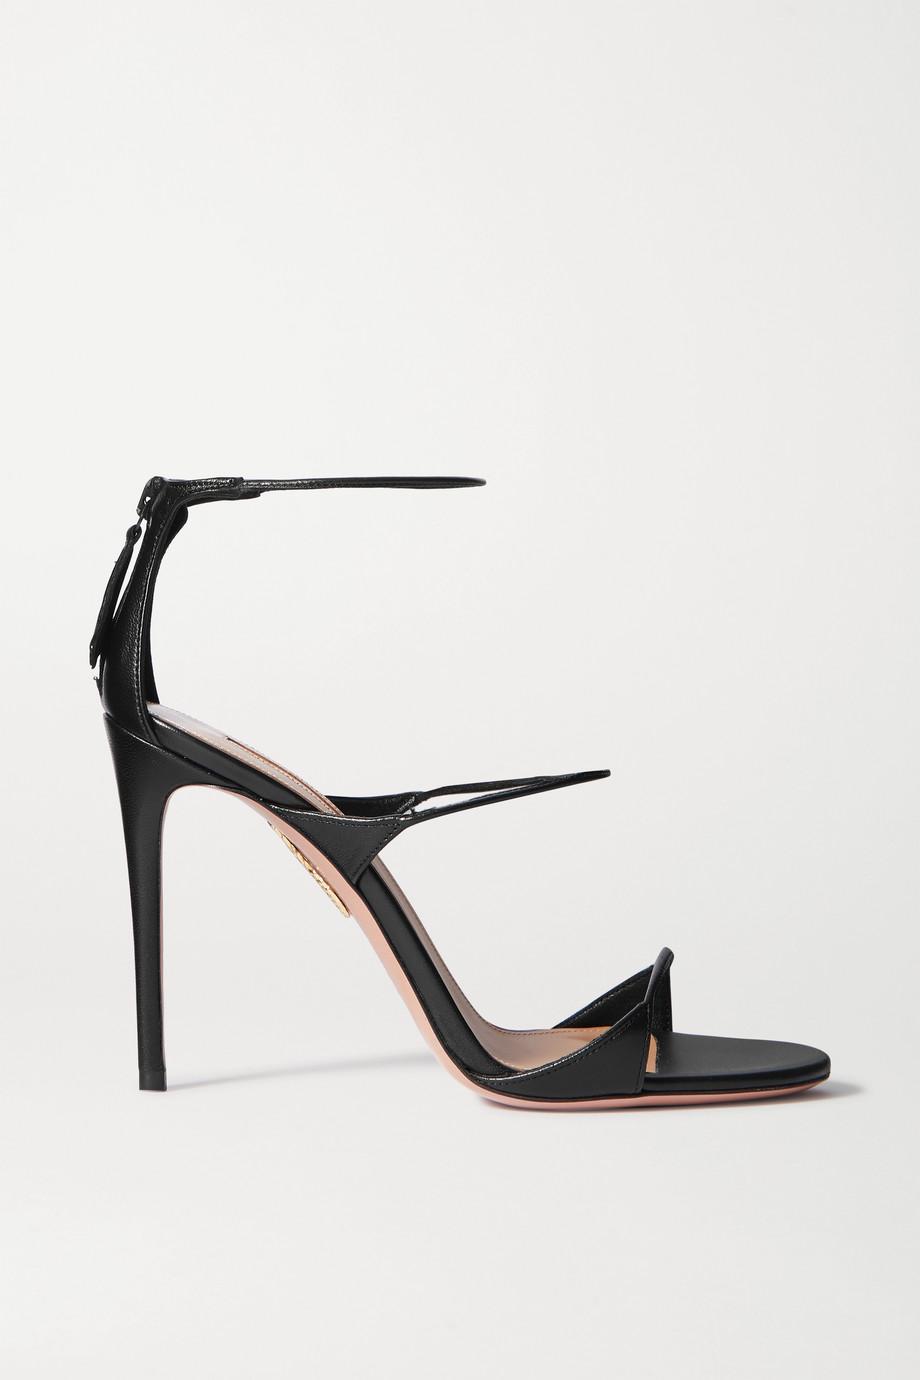 Aquazzura Minute 105 leather sandals